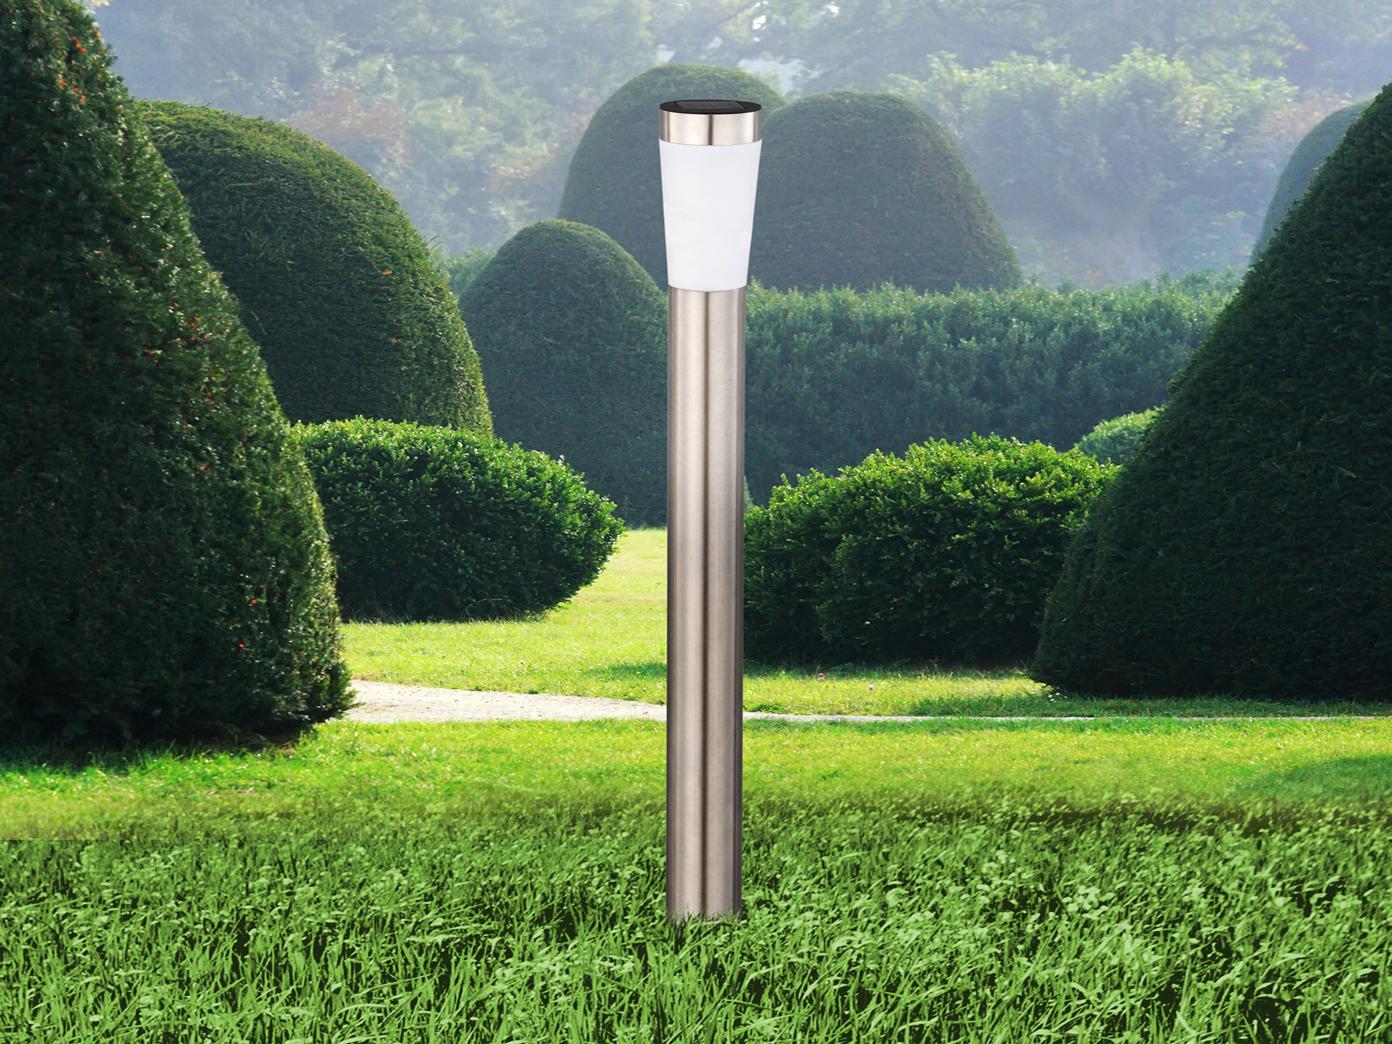 led erdspieß solarlampen - 2er set für den garten - edelstahl